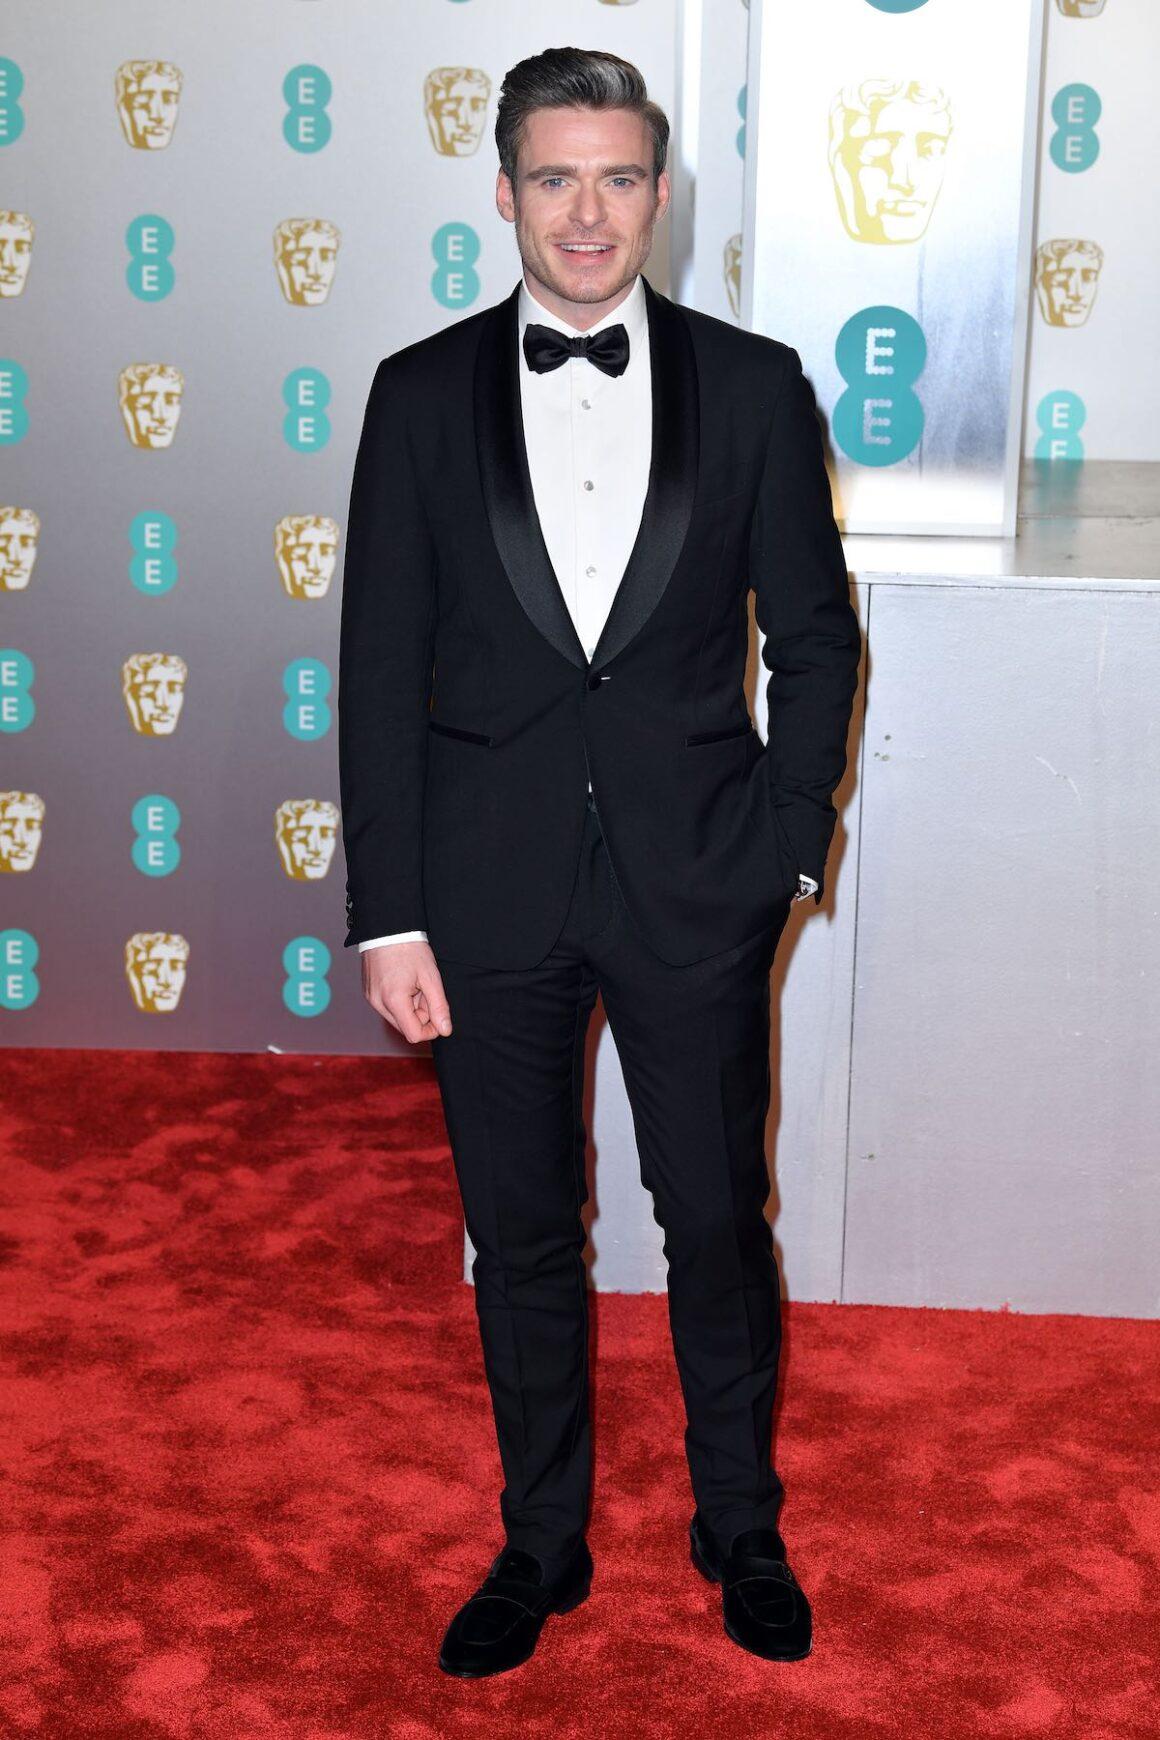 Richard Madden EE British Academy Film Awards - Red Carpet Arrivals